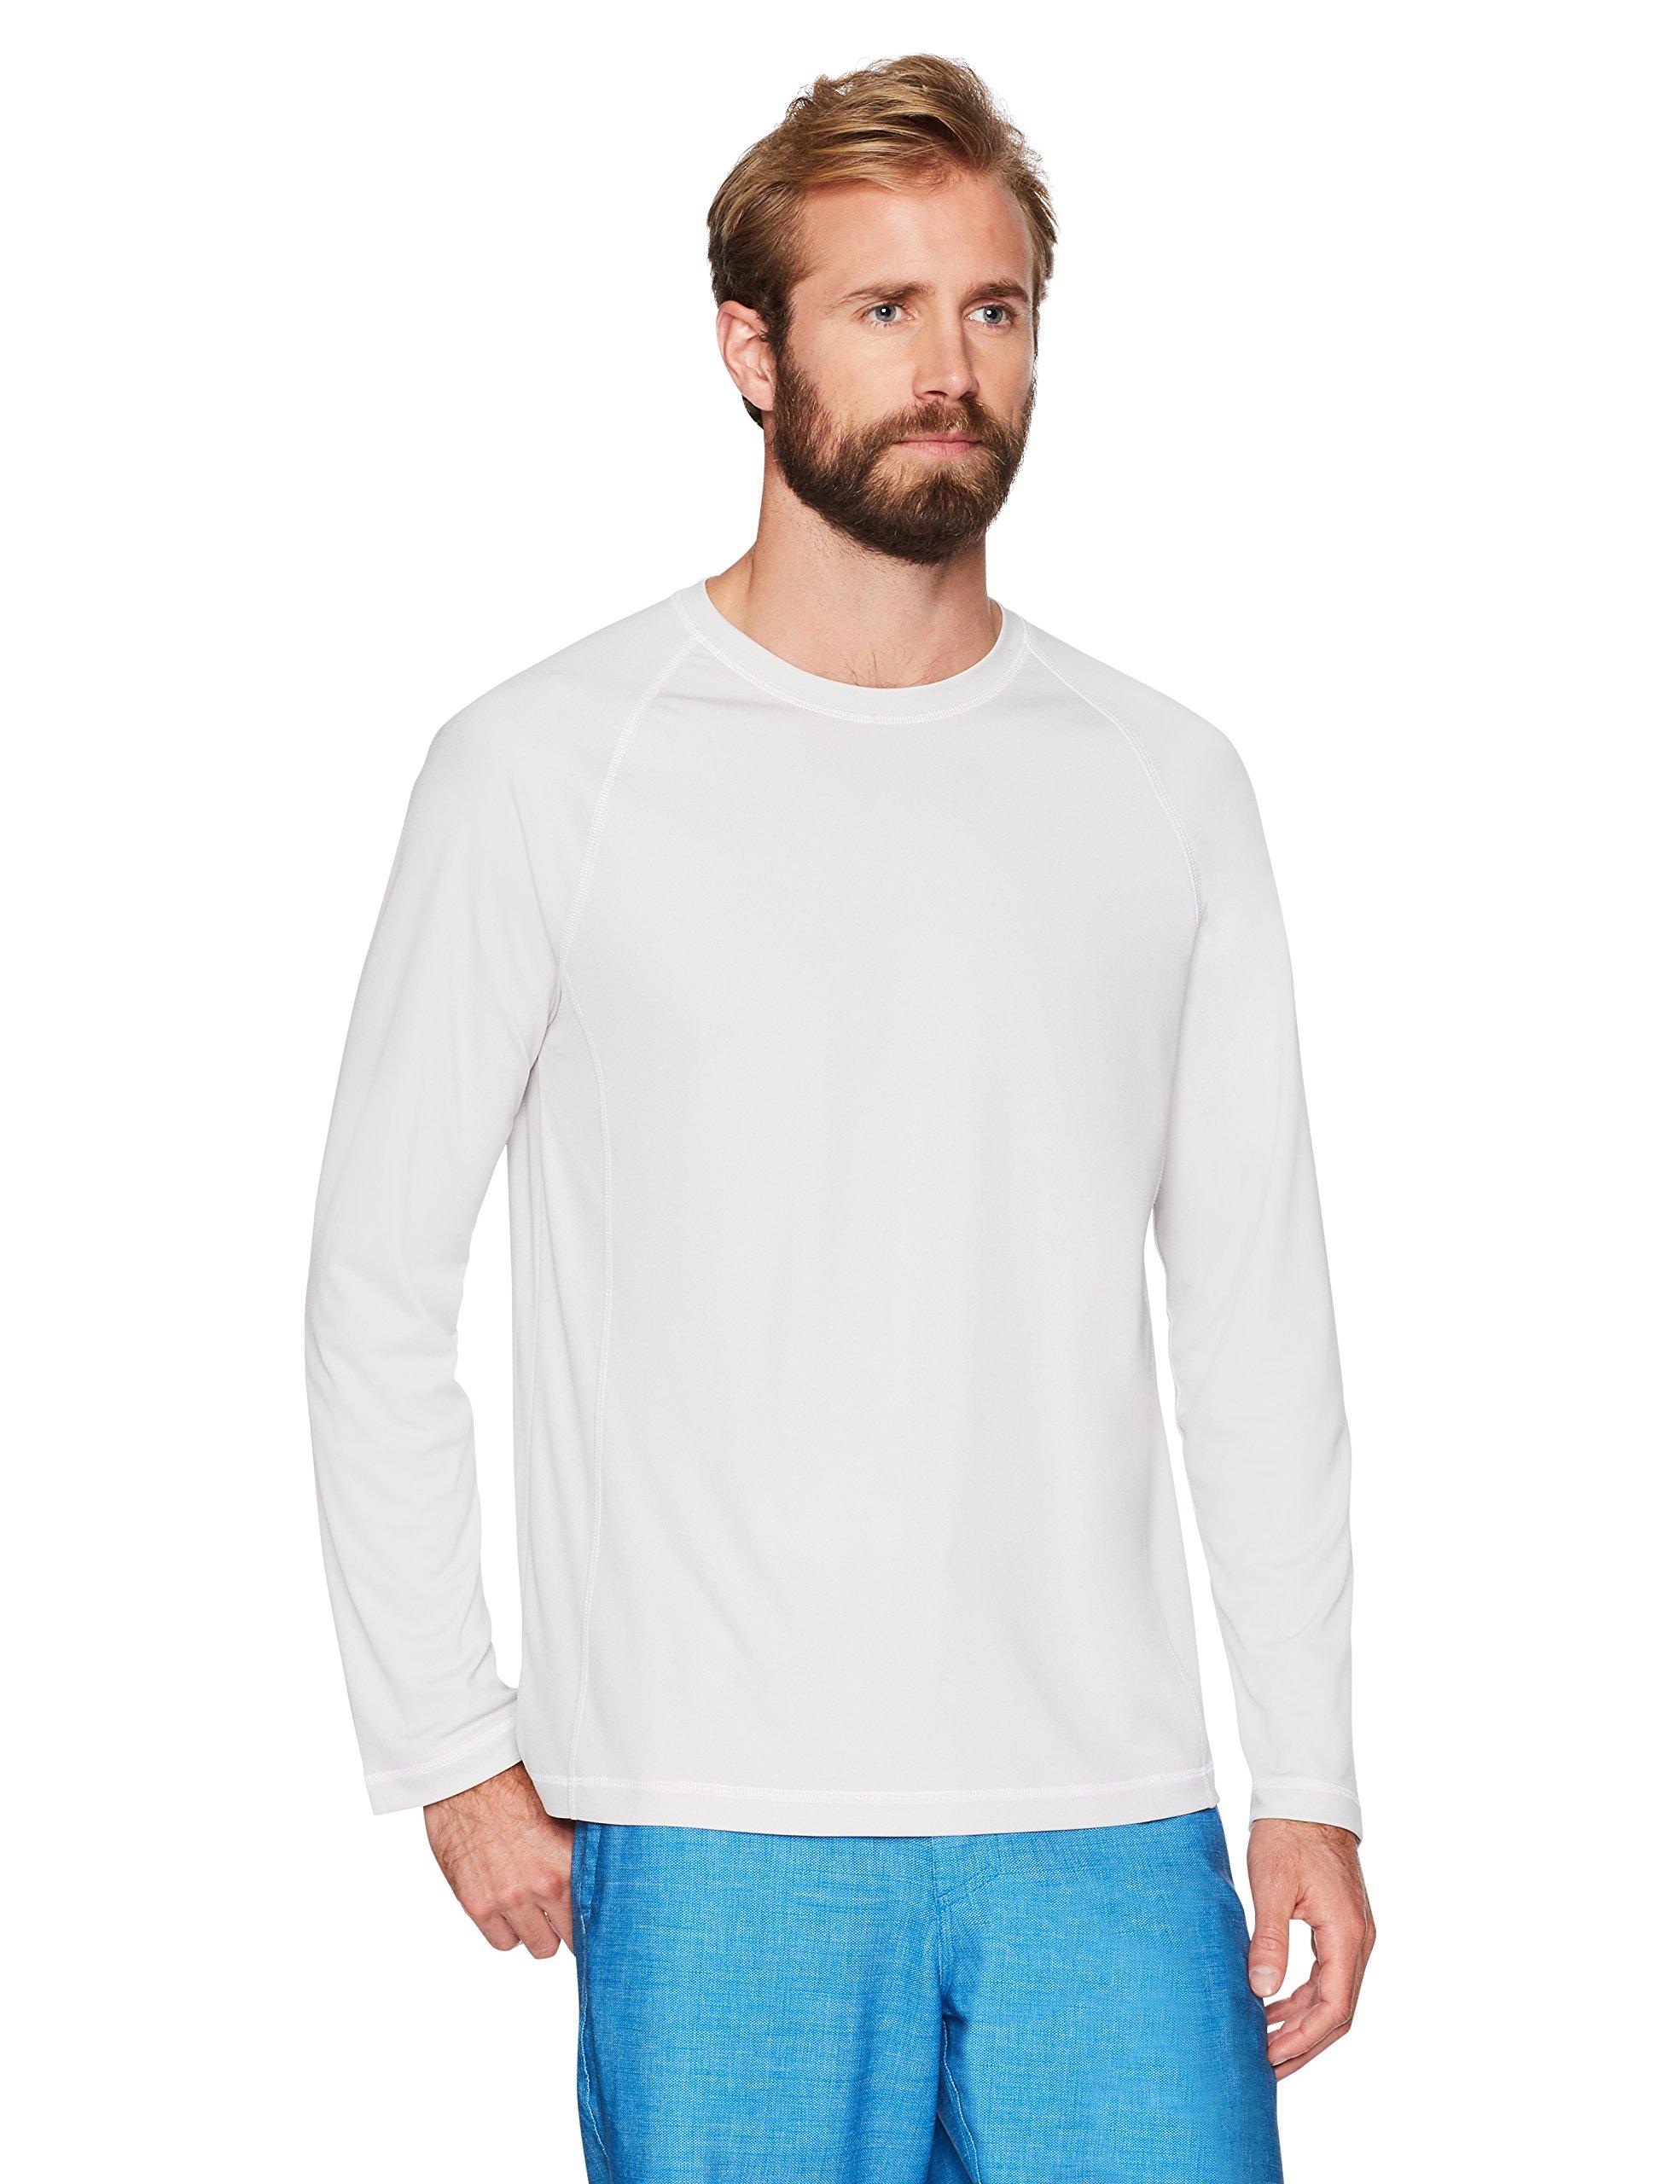 Amazon Essentials Men's Long-Sleeve Quick-Dry UPF 50 Swim Tee, Silver, Medium by Amazon Essentials (Image #2)